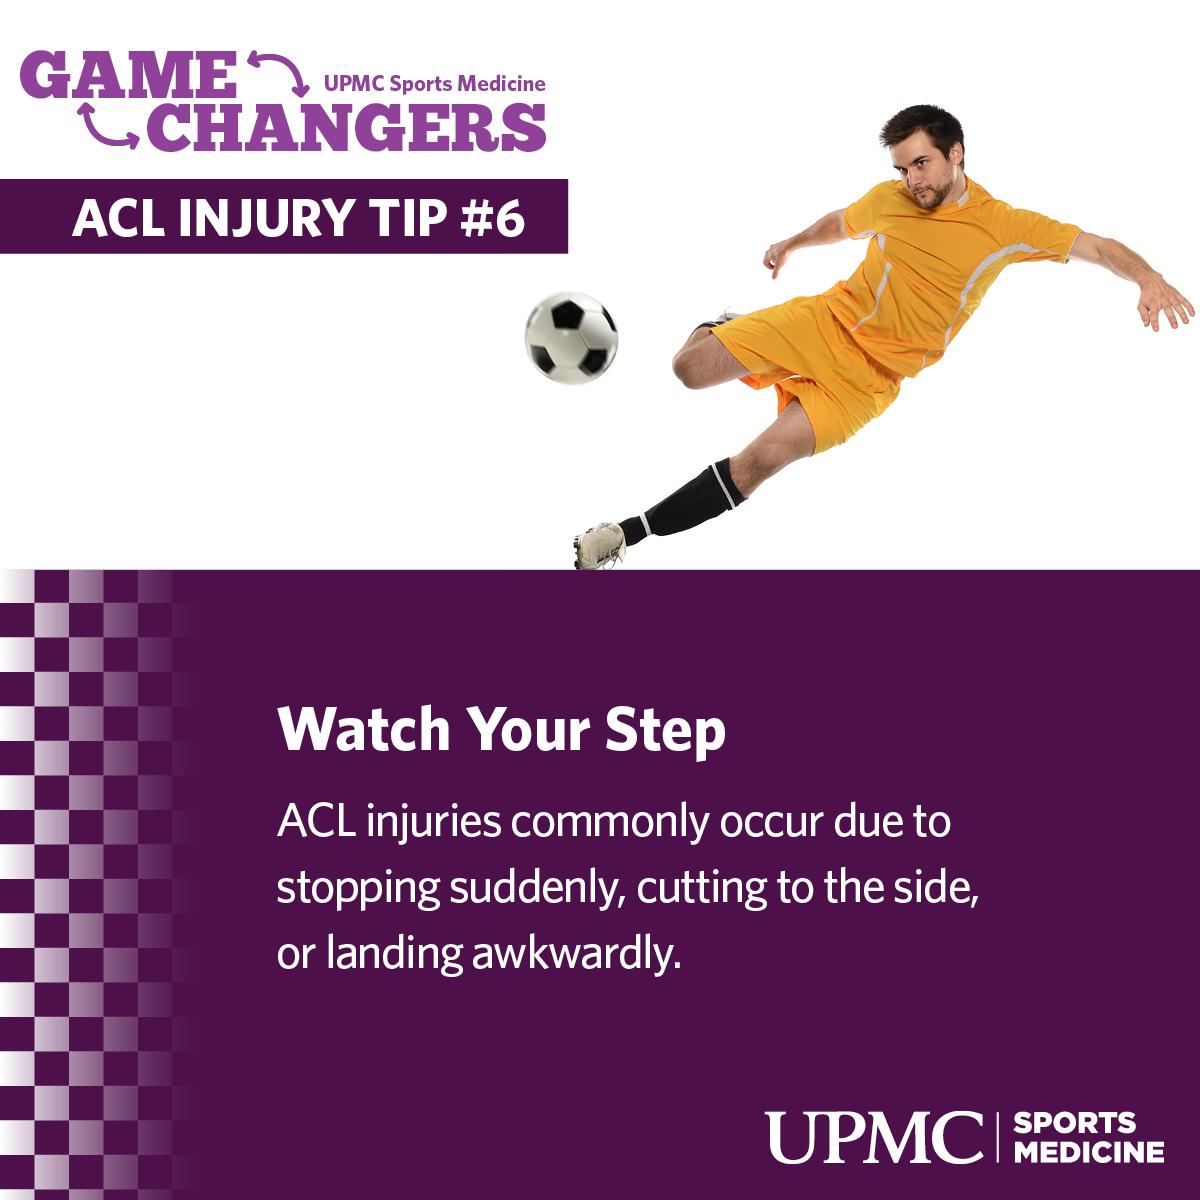 UPMC_GameChangers_ACL_FB6_FINAL